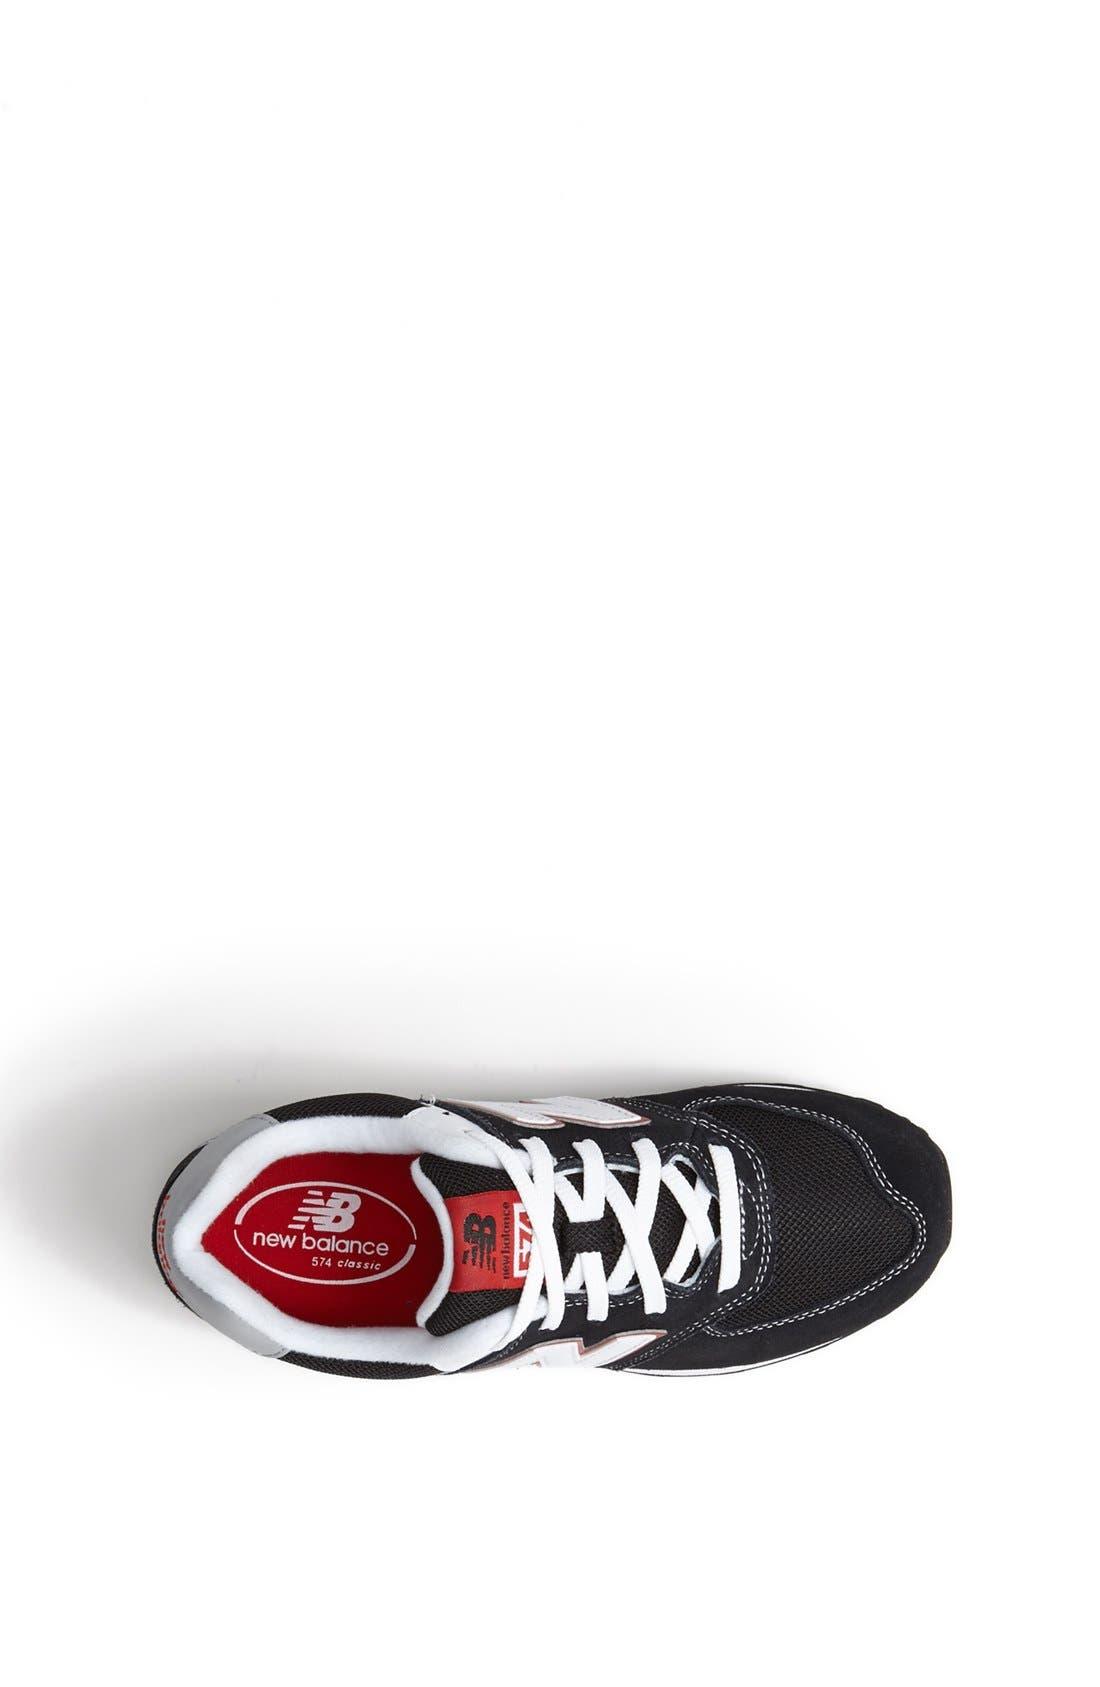 Alternate Image 3  - New Balance '574 Classic' Sneaker (Baby, Walker, Toddler, Little Kid & Big Kid)